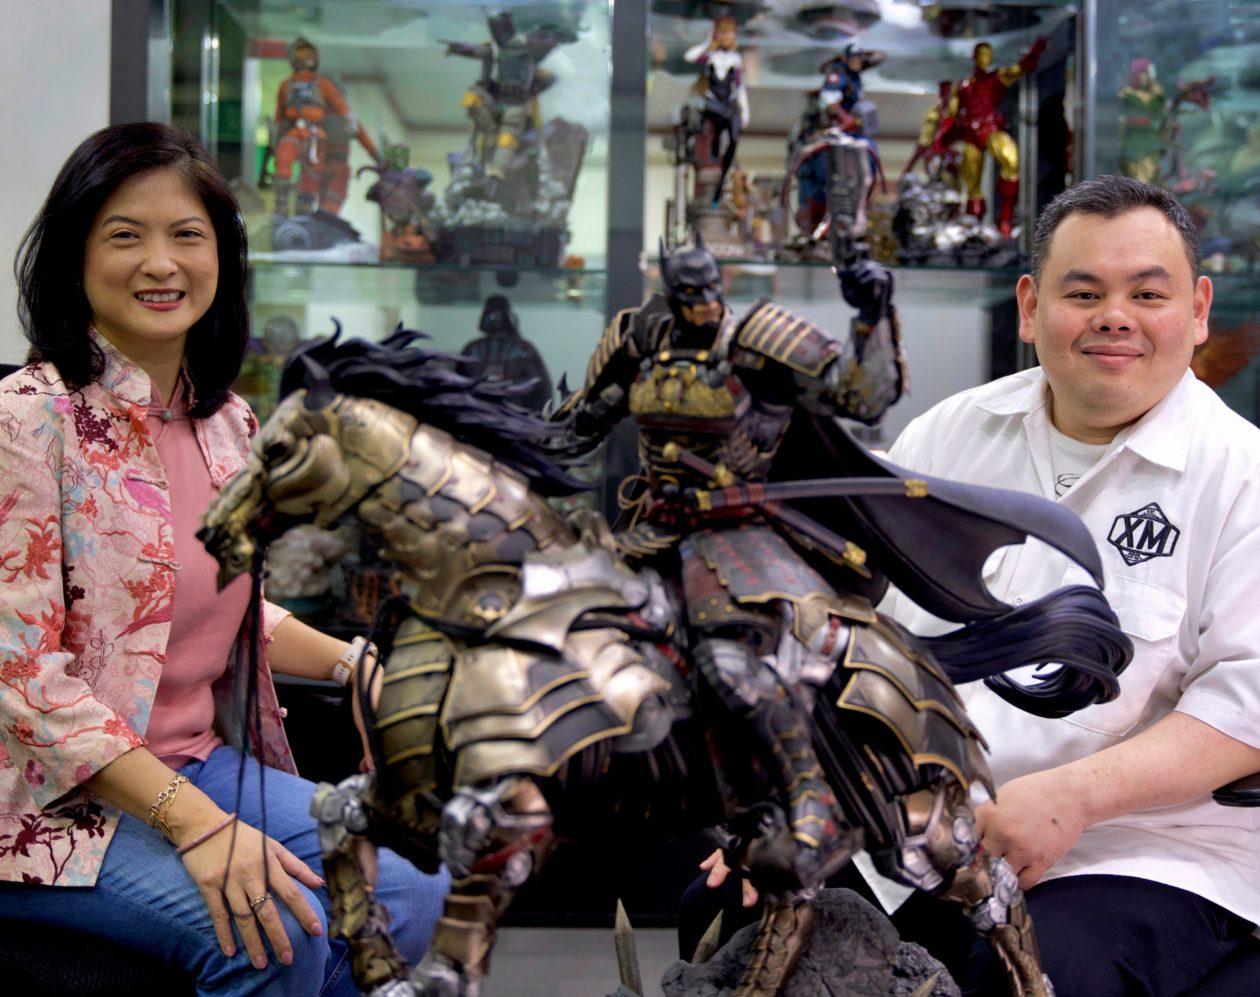 XM Studios CEO Ben Ang and ADDX CCO Oi Yee Choo, with XM's premium collectible statue Batman Shogun, from the Batman Samurai Line.